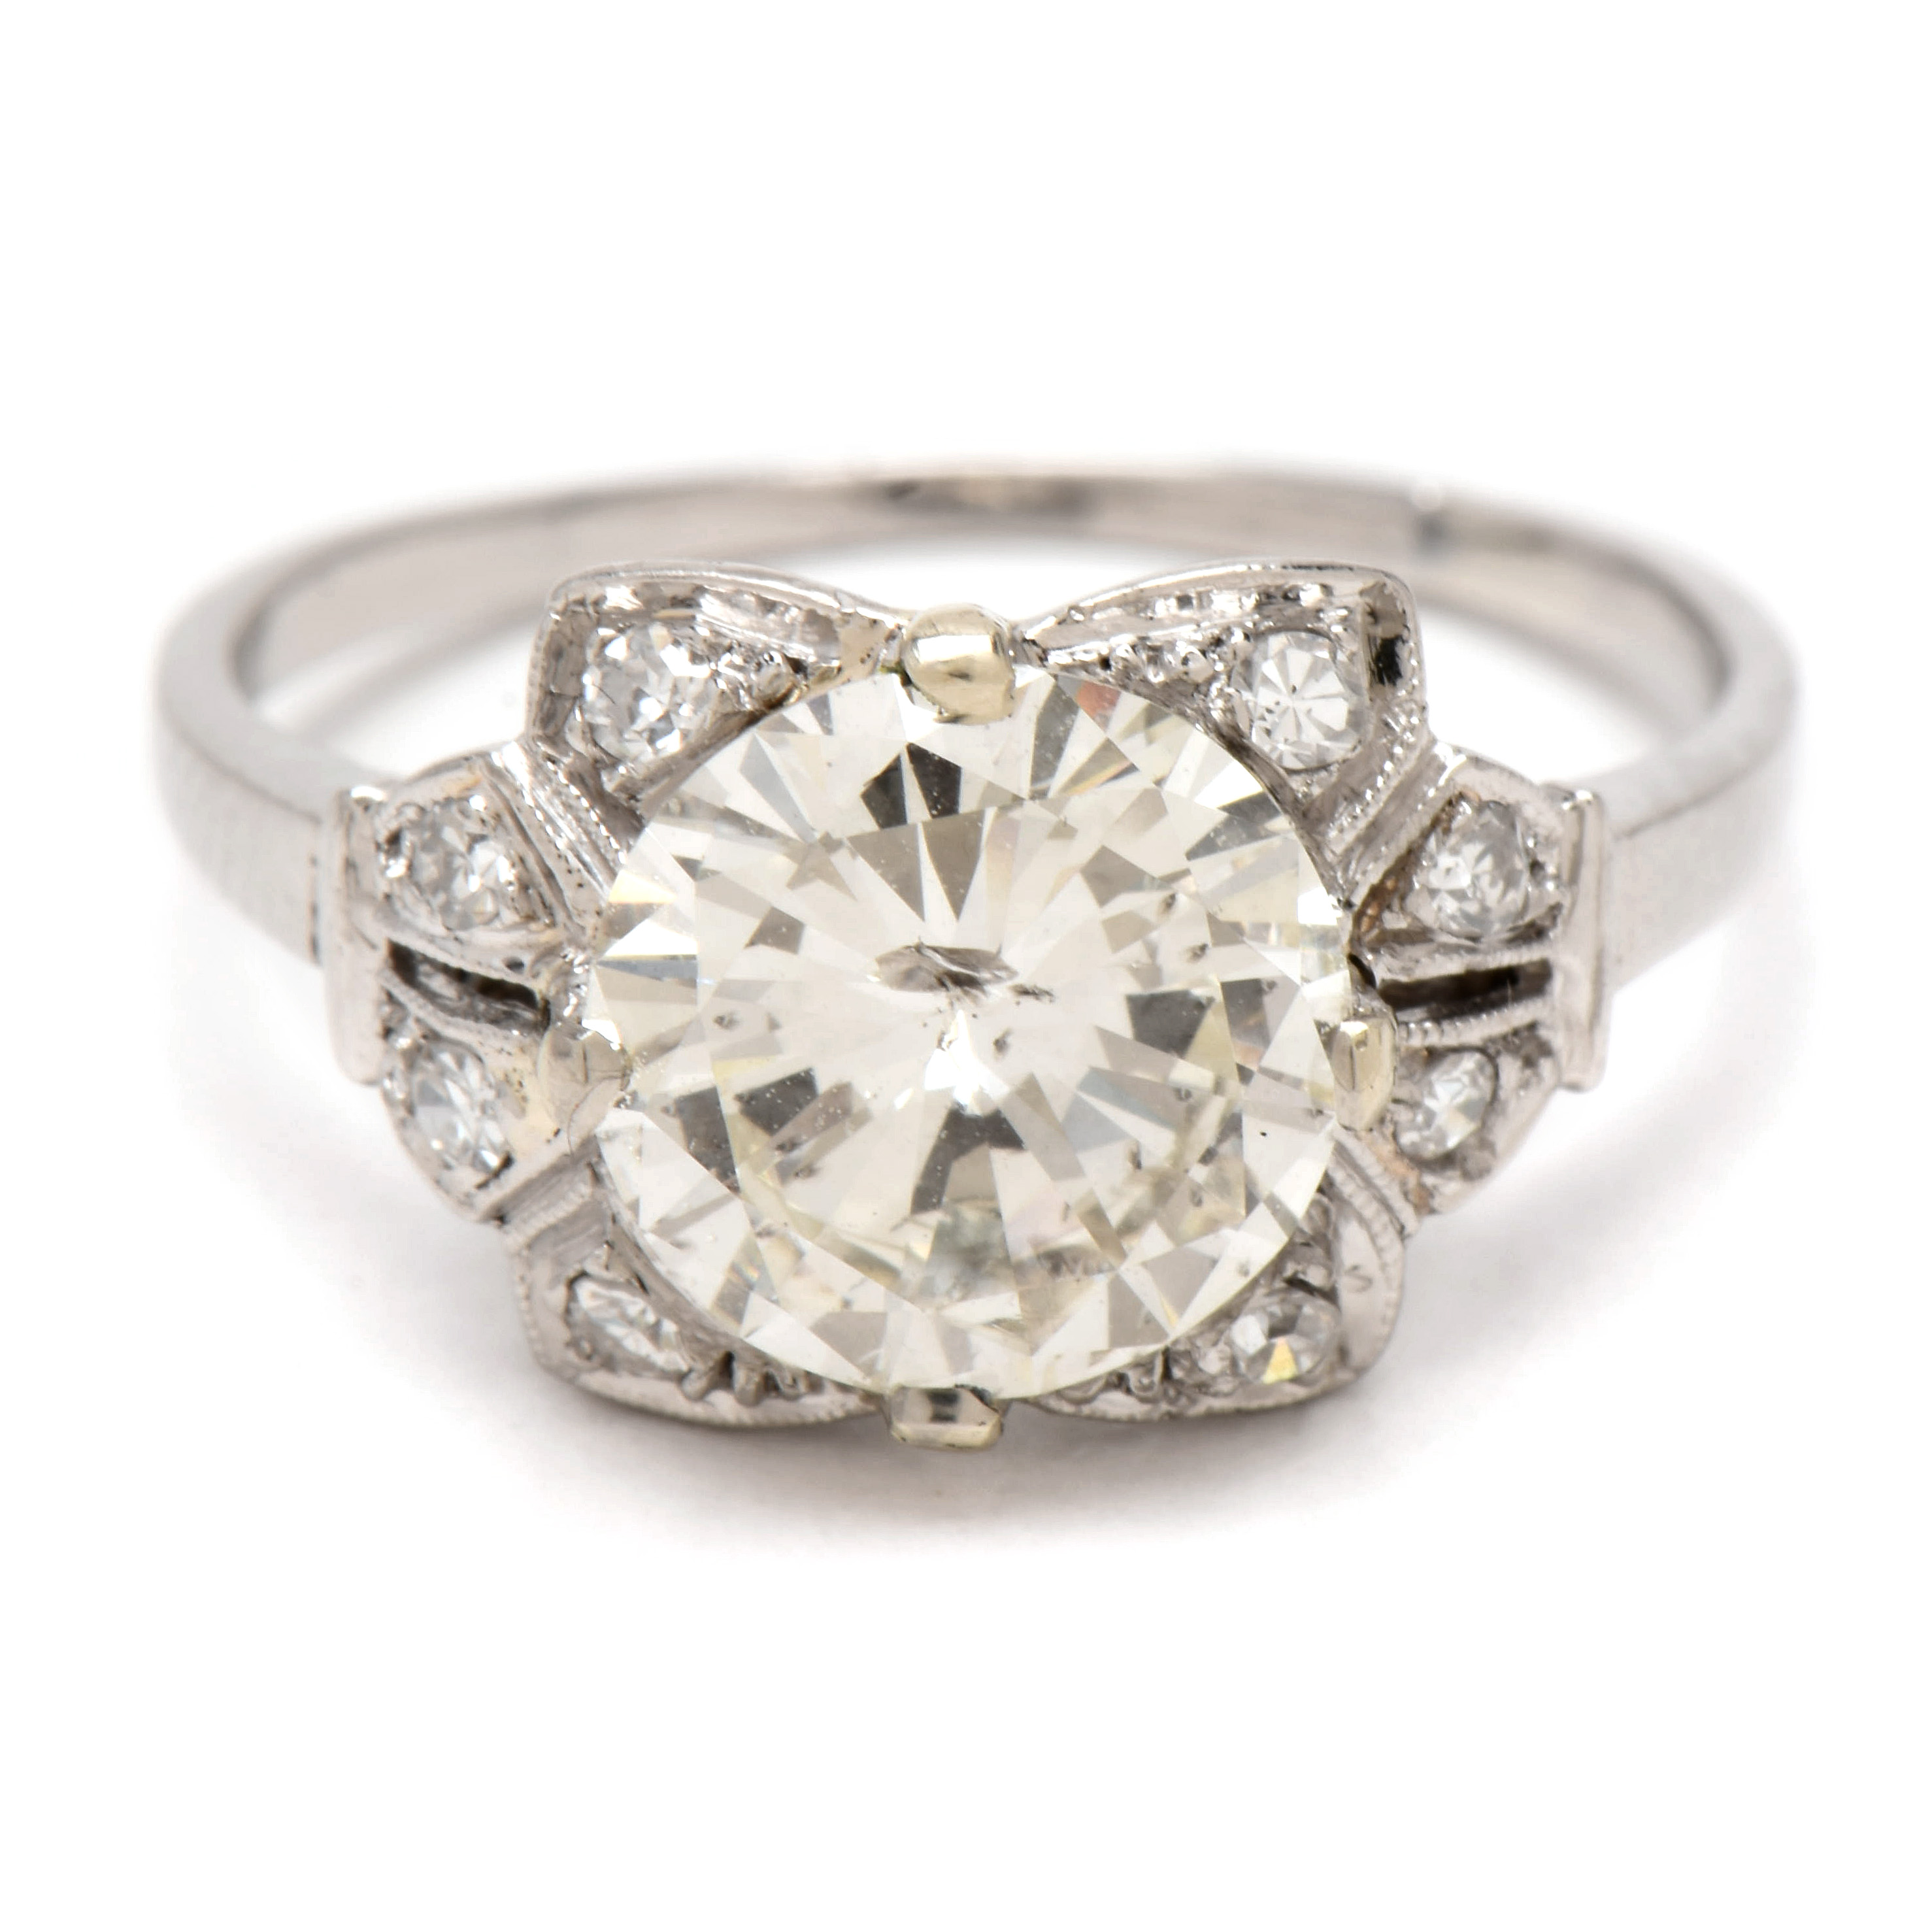 Vintage Designer Rings Engagement Ring Auctions Online Ring